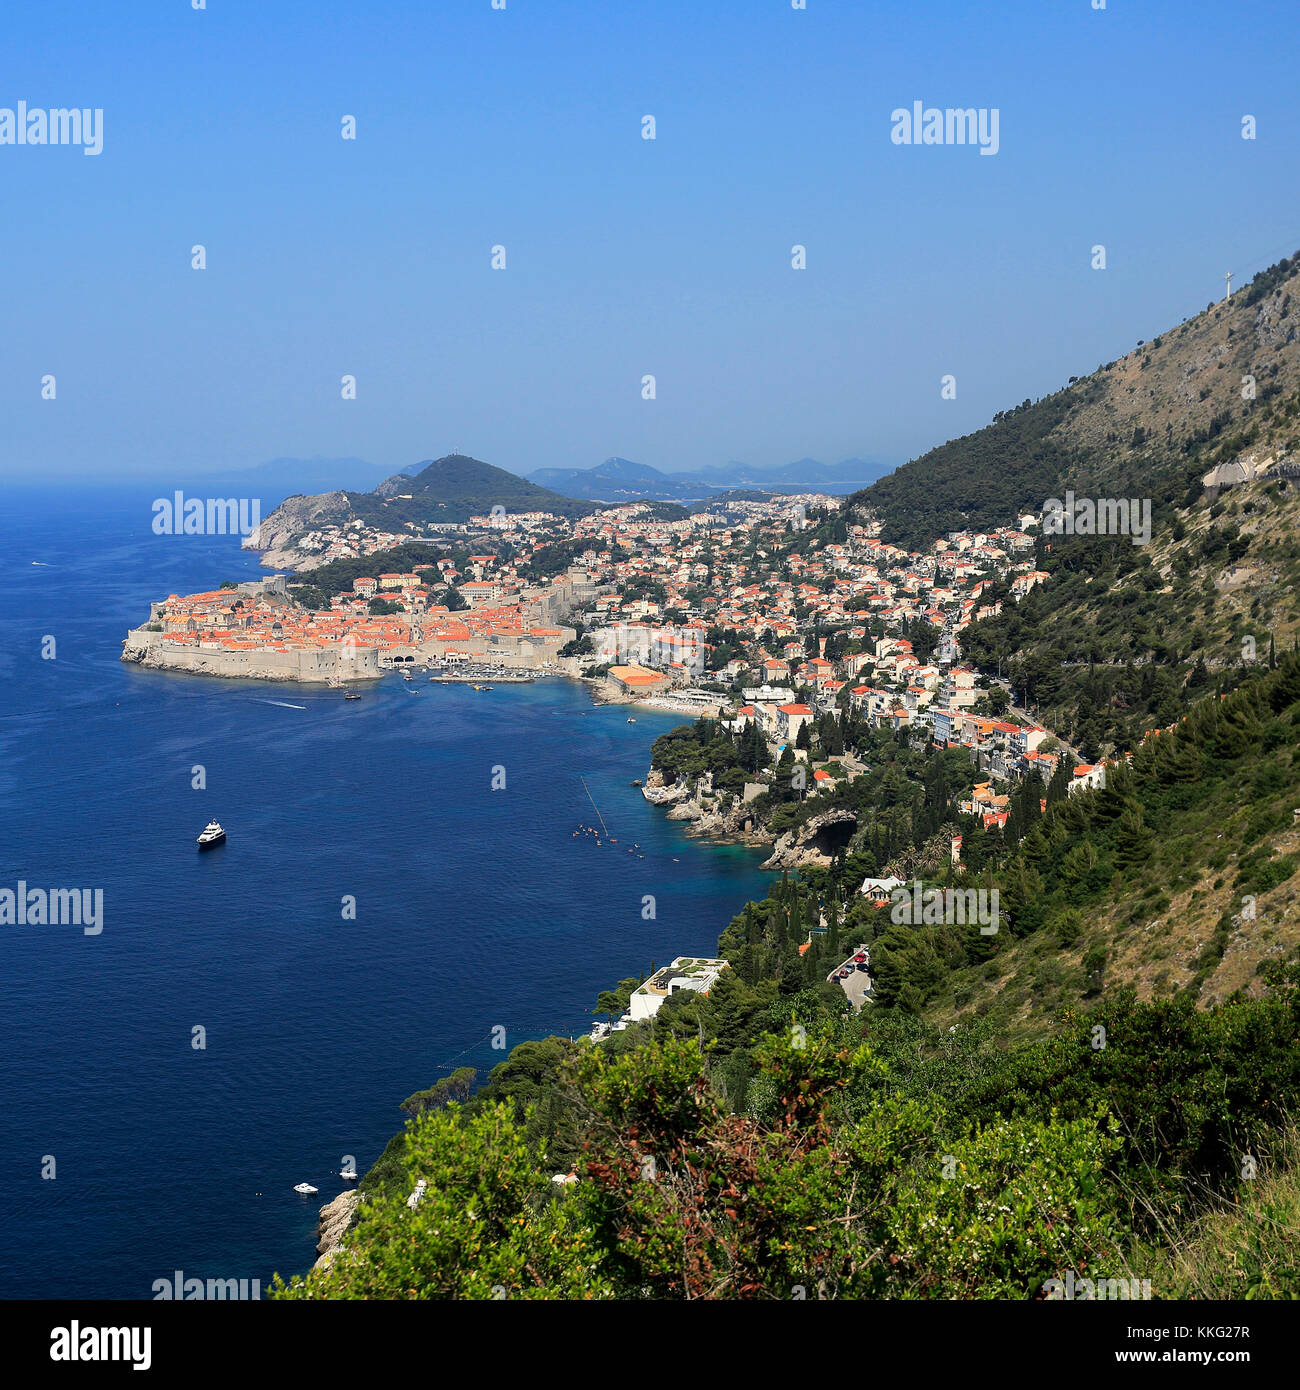 The Adreatic Sea and City of Dubrovnik, Dalmatian coast, Croatia, Balkans, Europe, UNESCO World Heritage Site. - Stock Image